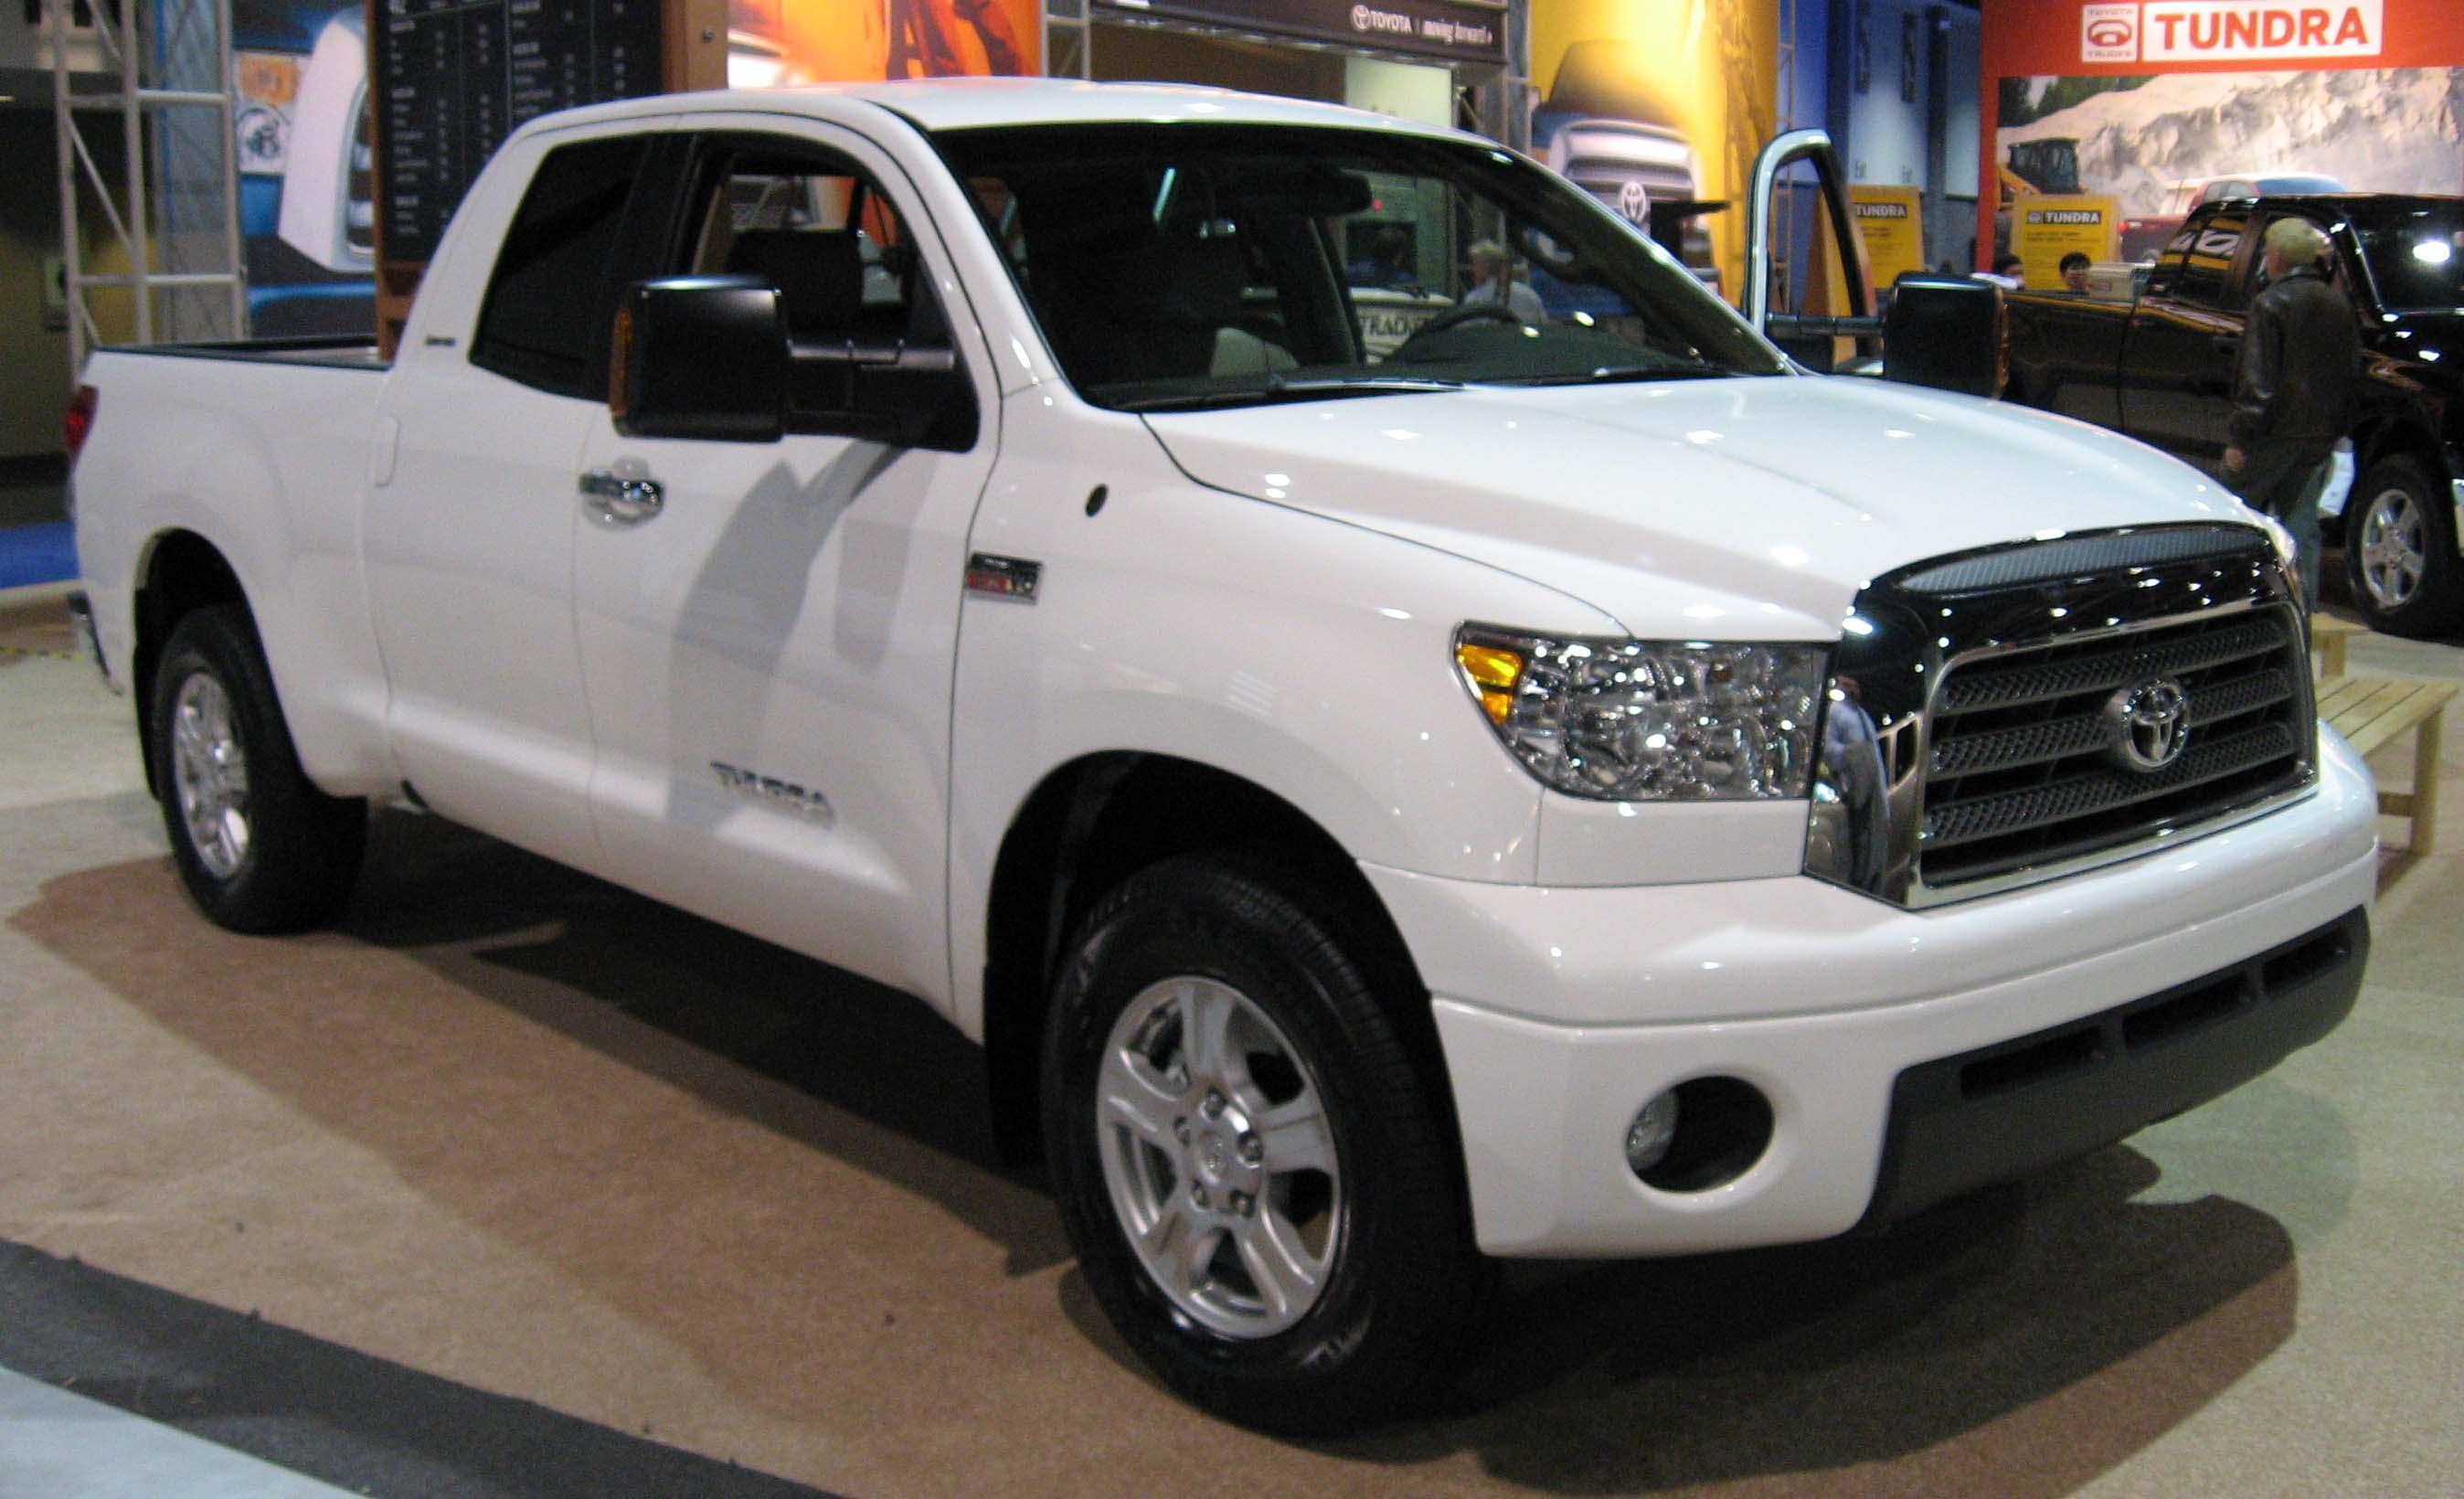 Toyota Тундра белая #8